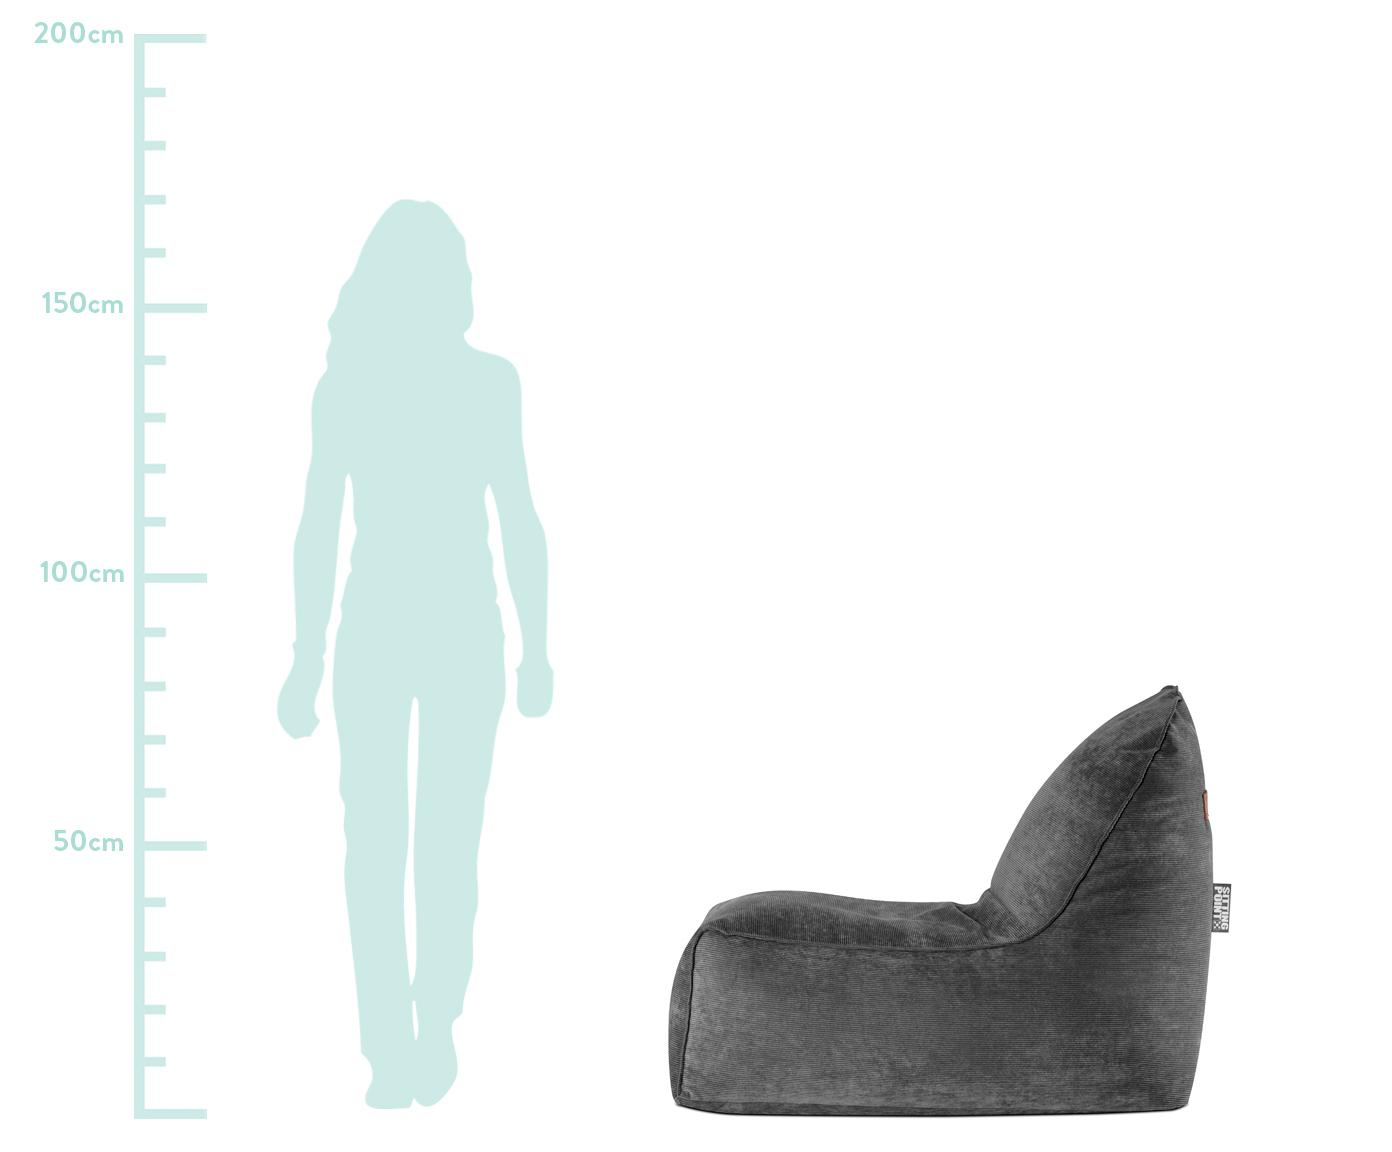 Cord-Sitzsack Cordone, Bezug: Cord (96% Polyester, 4% P, Griff: Polyester (Lederimitat), Anthrazit, 70 x 80 cm